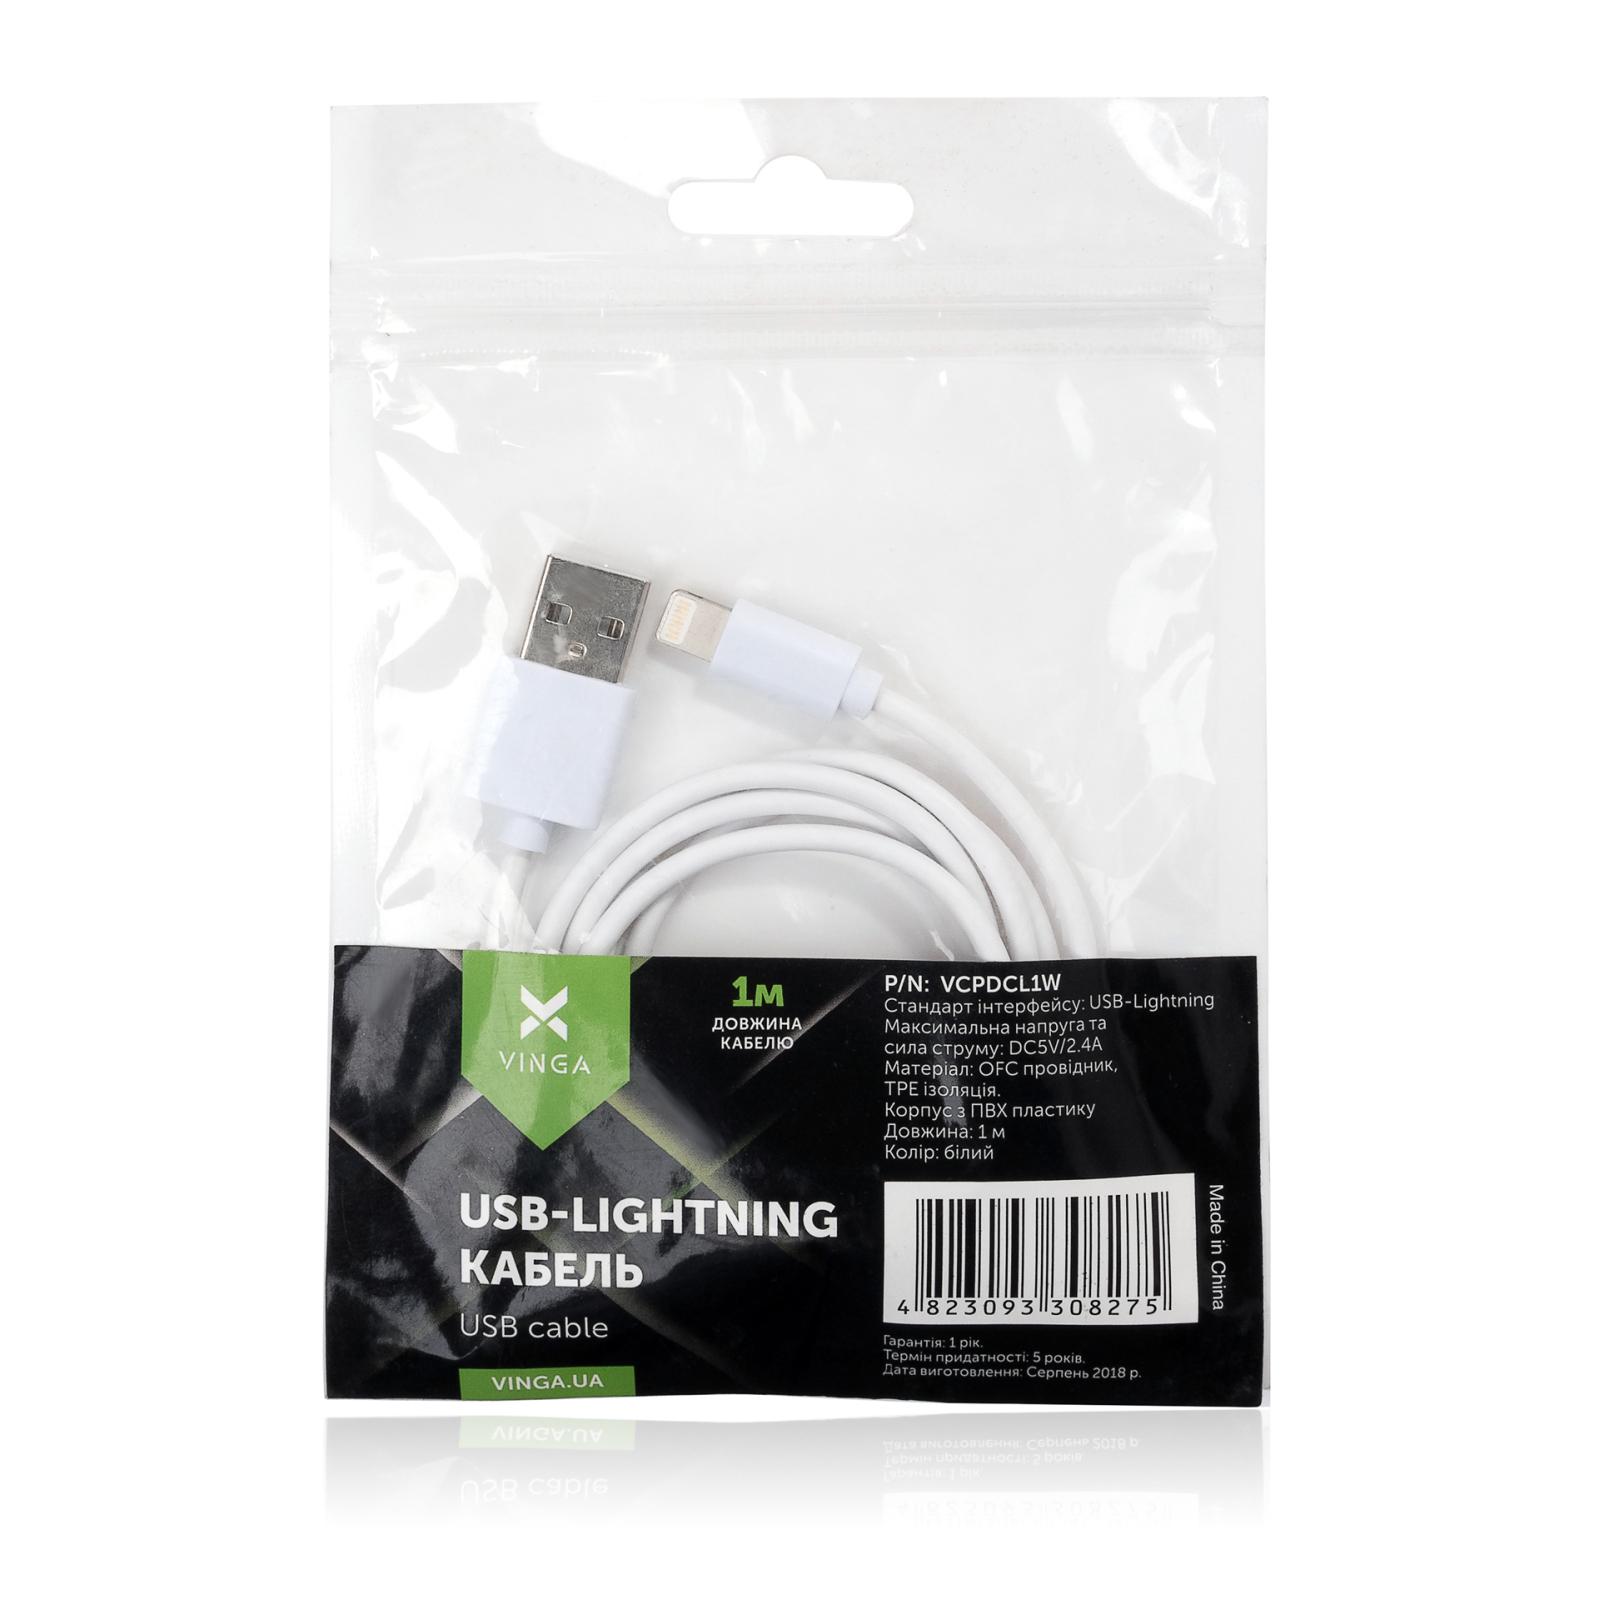 Дата кабель USB 2.0 AM to Lightning PVC 1m white Vinga (VCPDCL1W) изображение 4